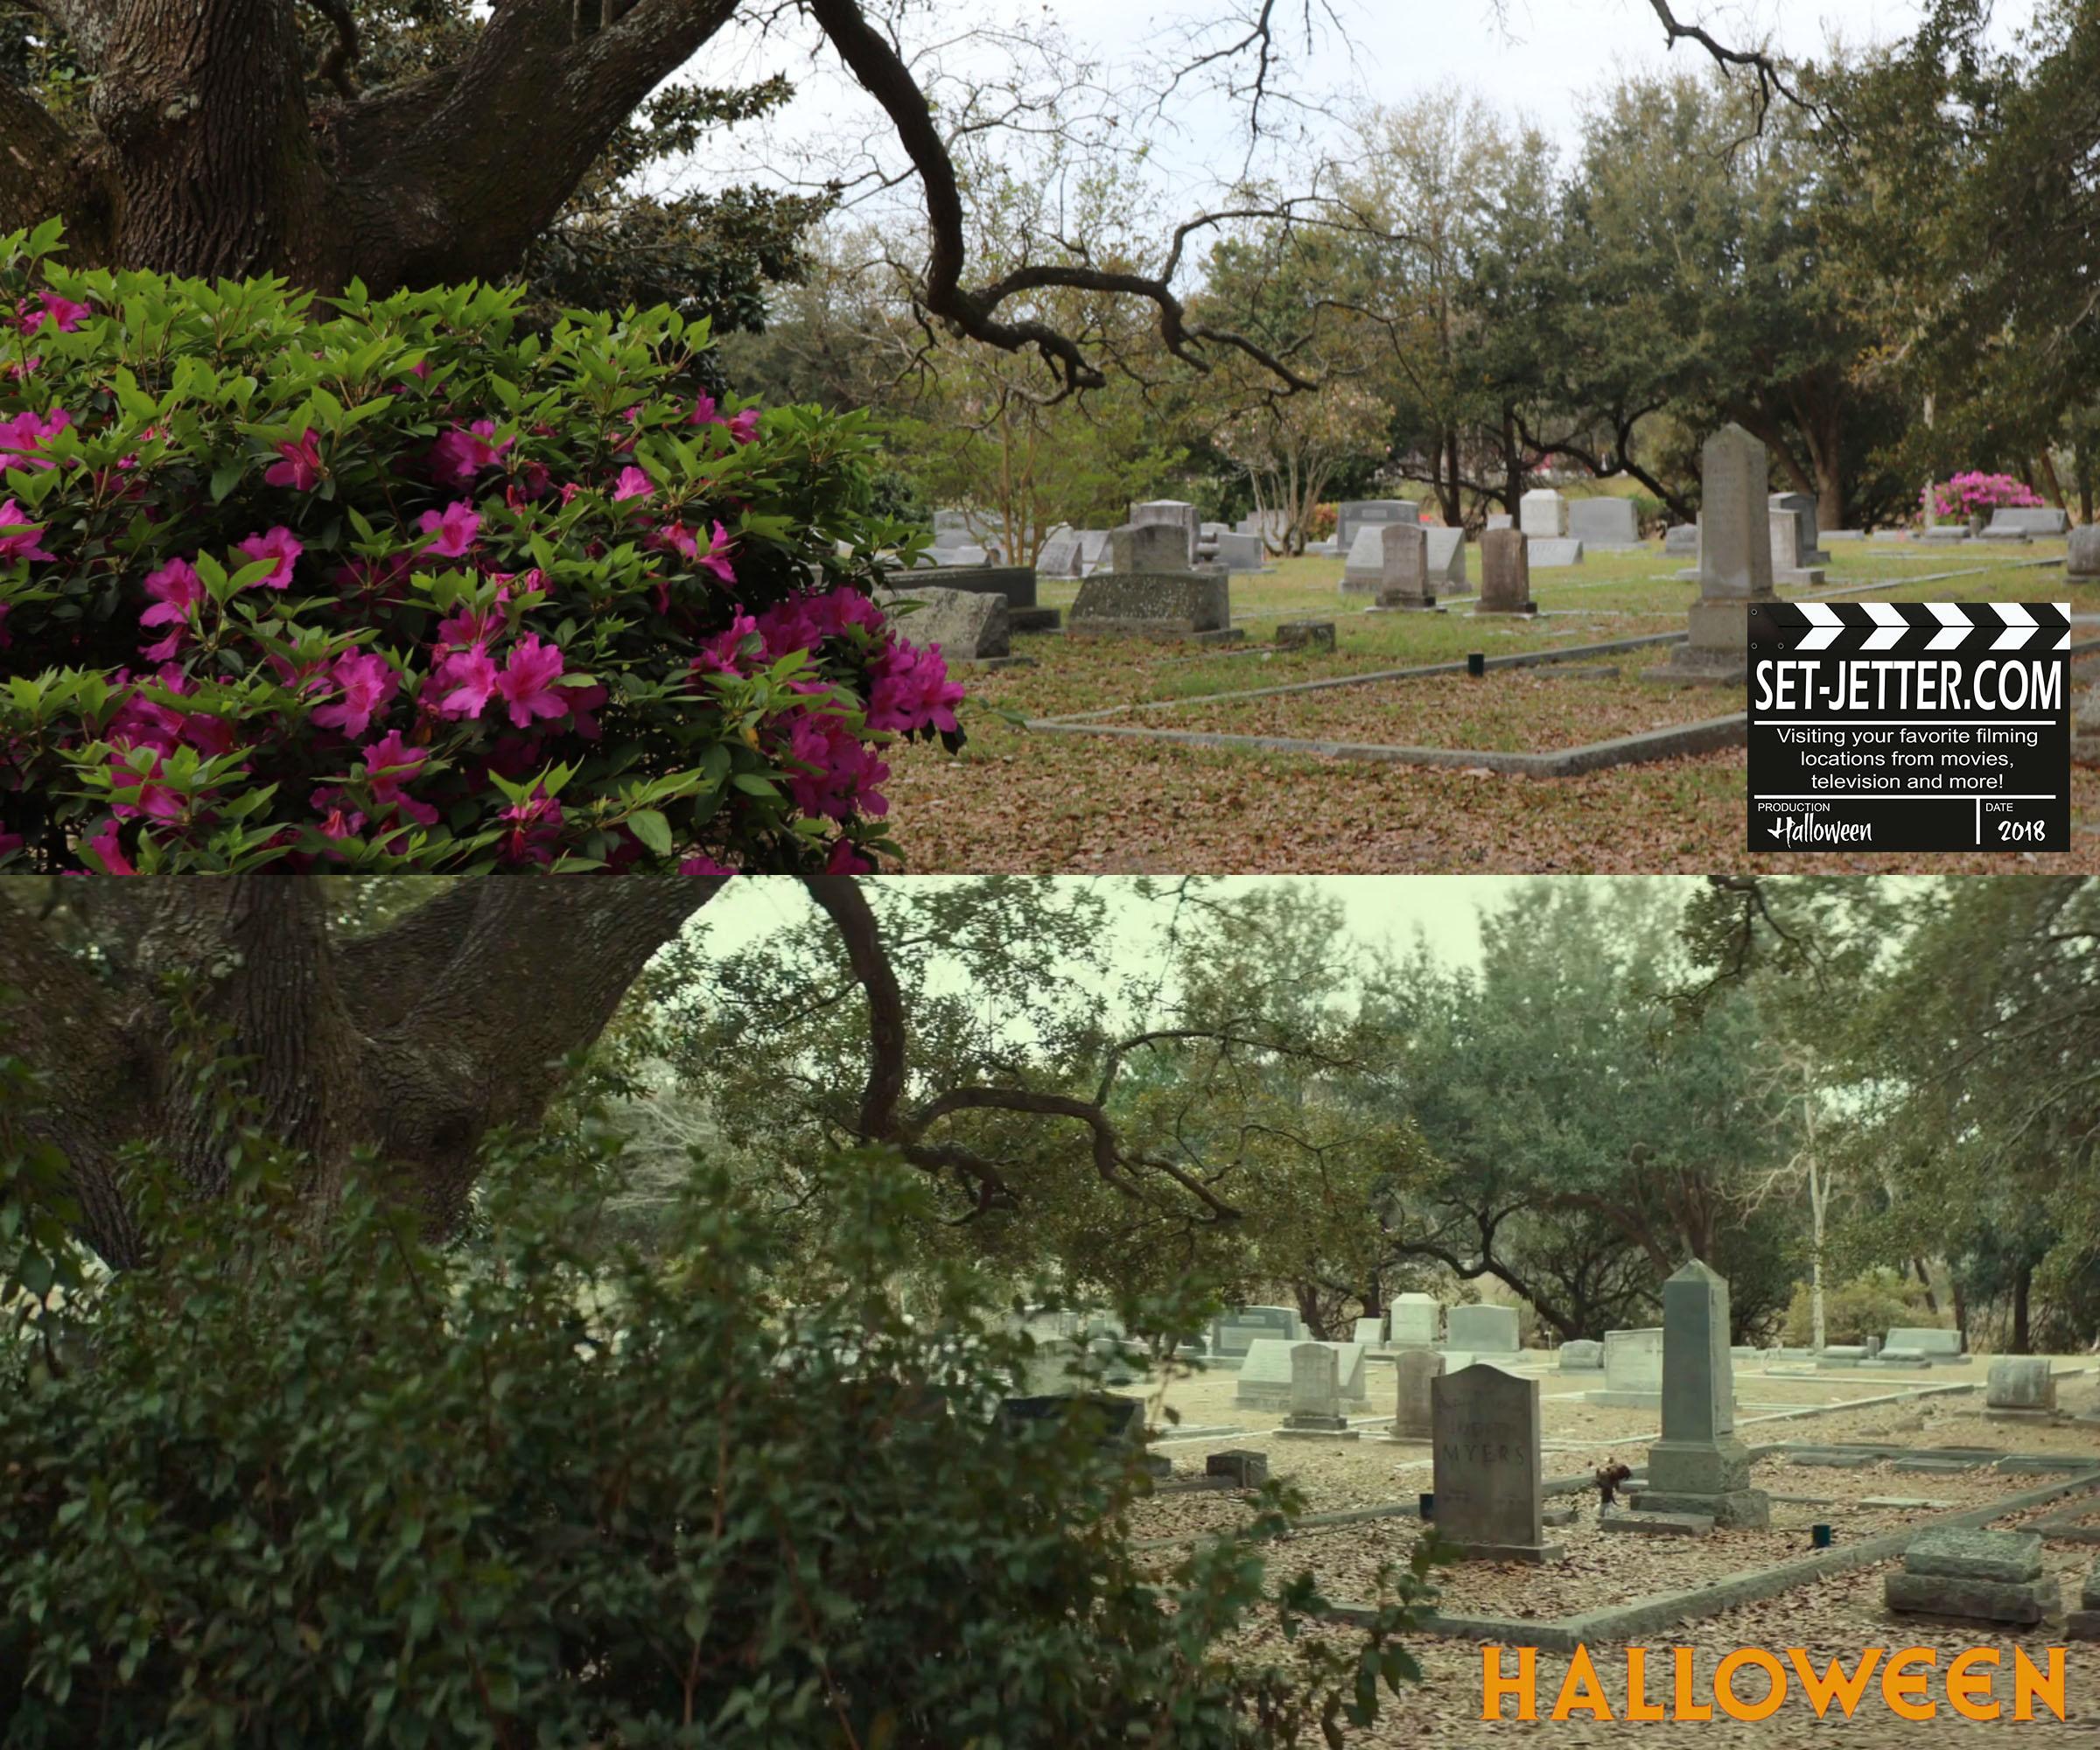 Halloween 396.jpg